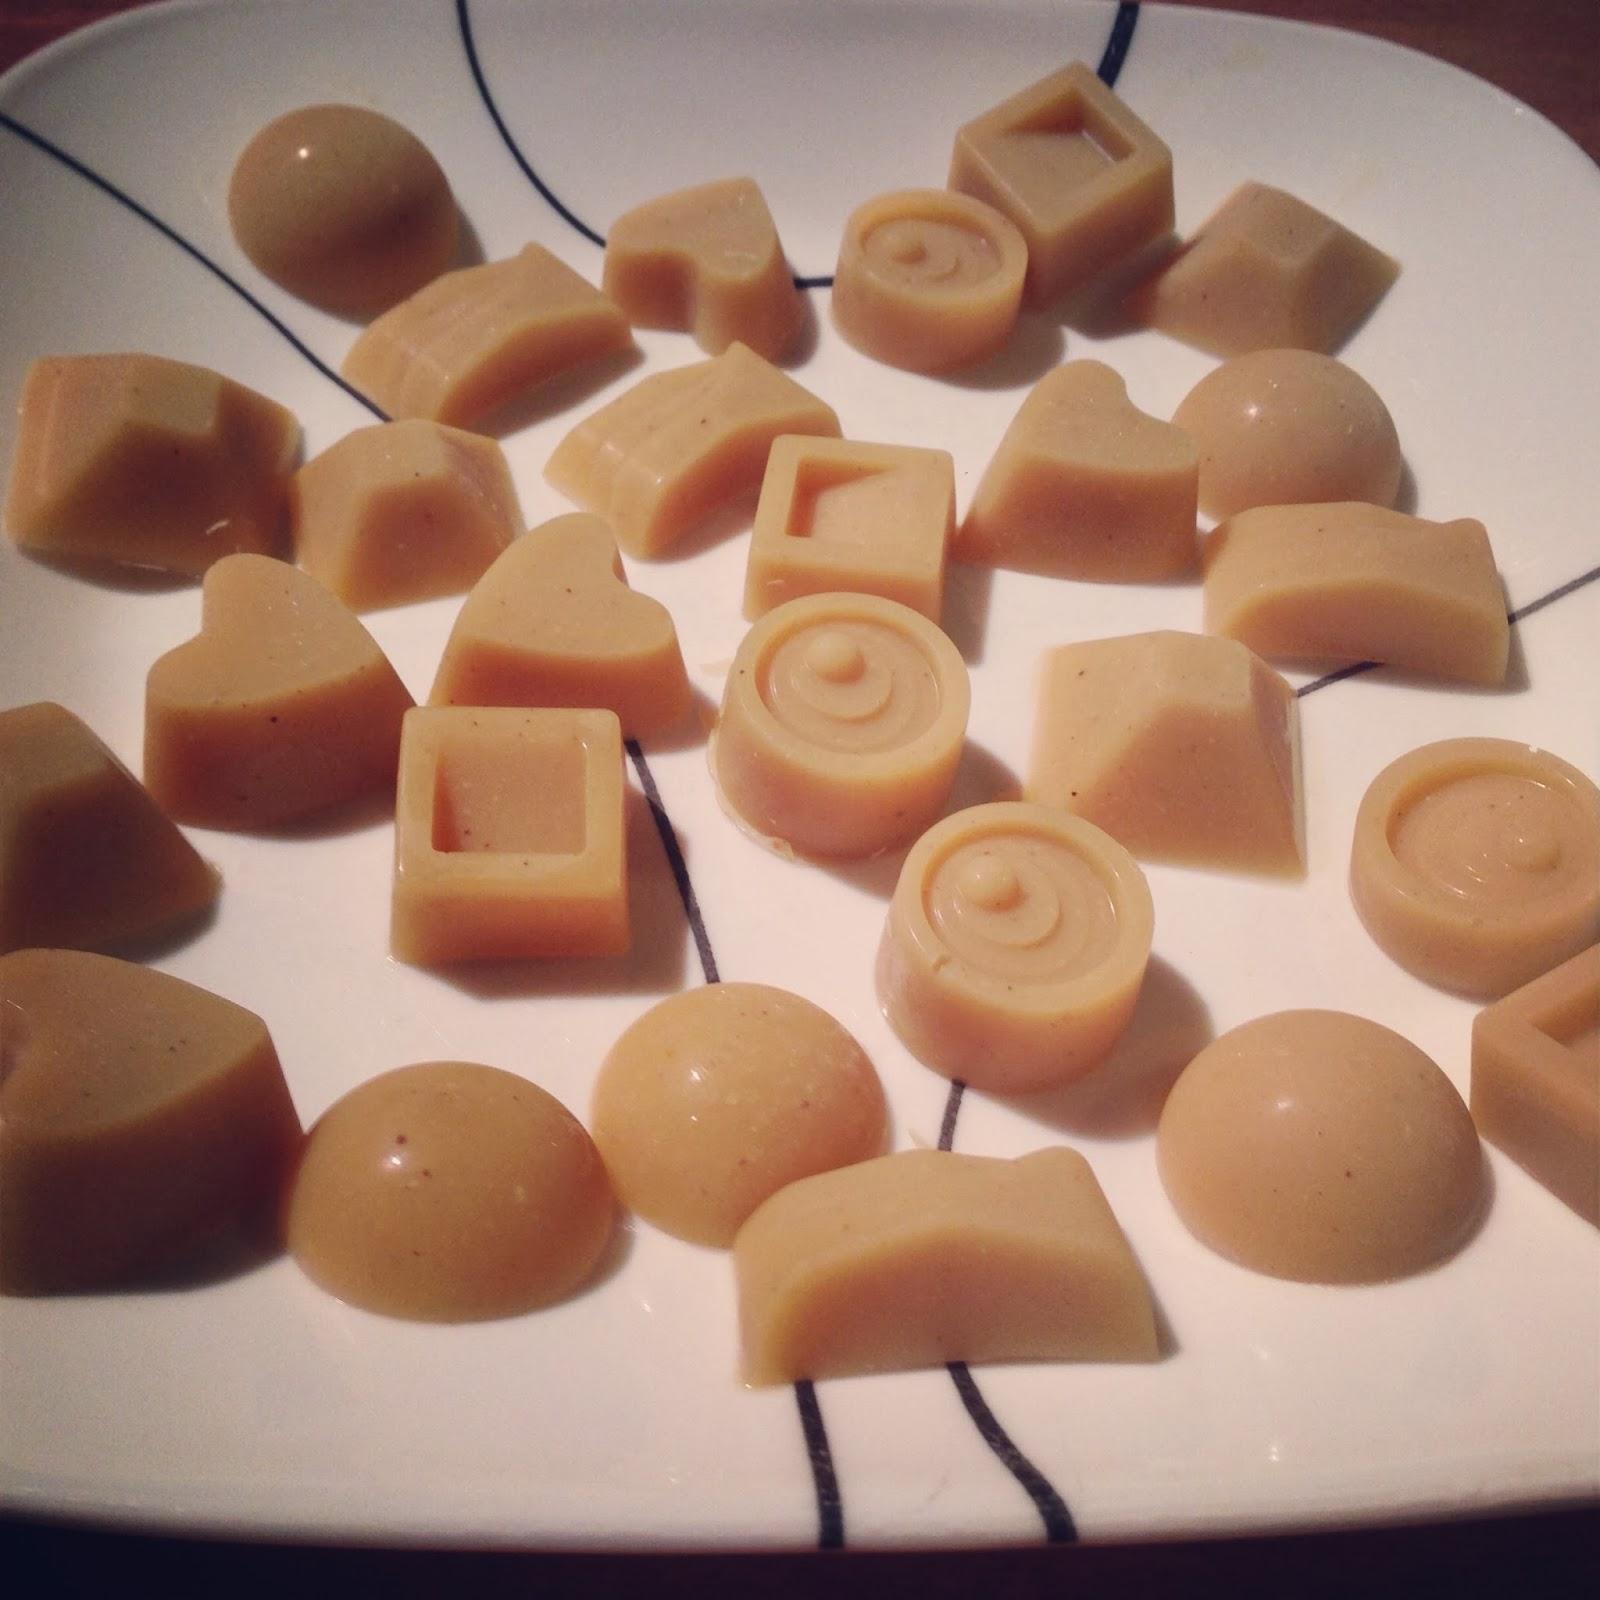 Chocolate Nonpareils White Dunmore Candy Kitchen: The Crohny Kitchen: White Chocolate Candies